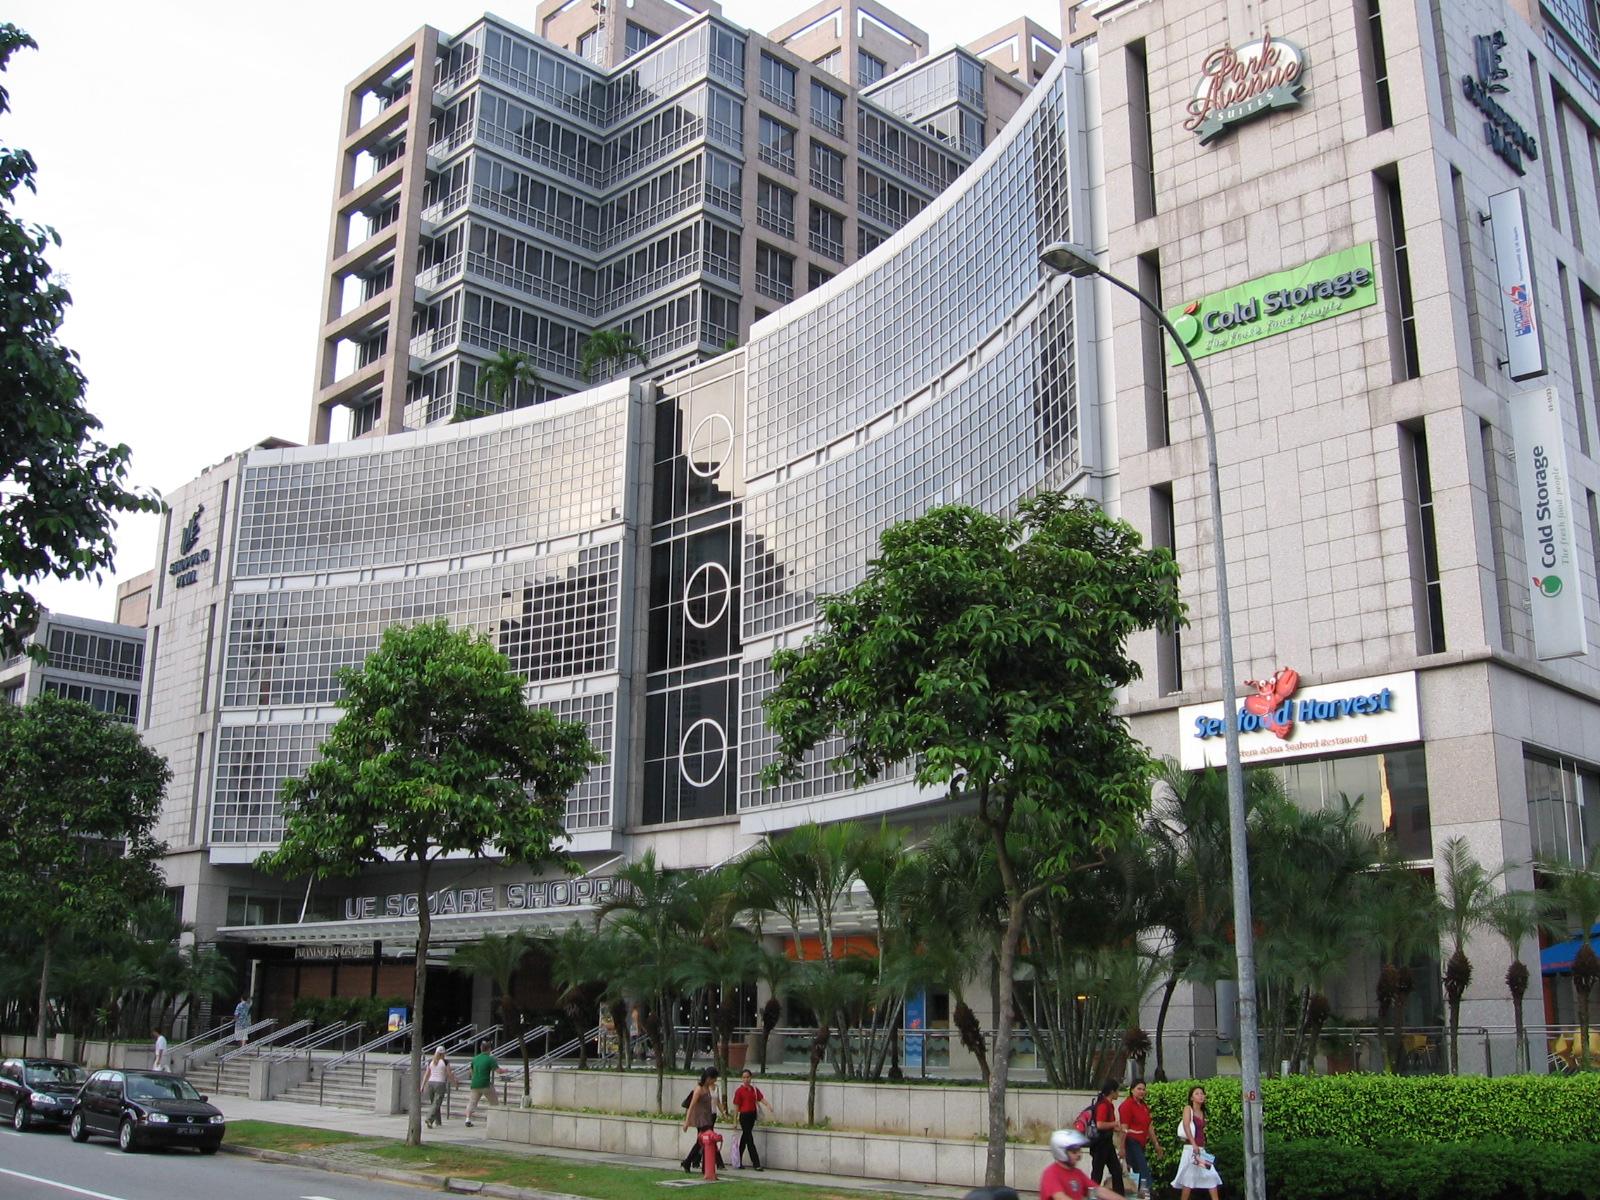 http://upload.wikimedia.org/wikipedia/commons/c/cd/UE_Square_Shopping_Mall_2,_Nov_05.JPG